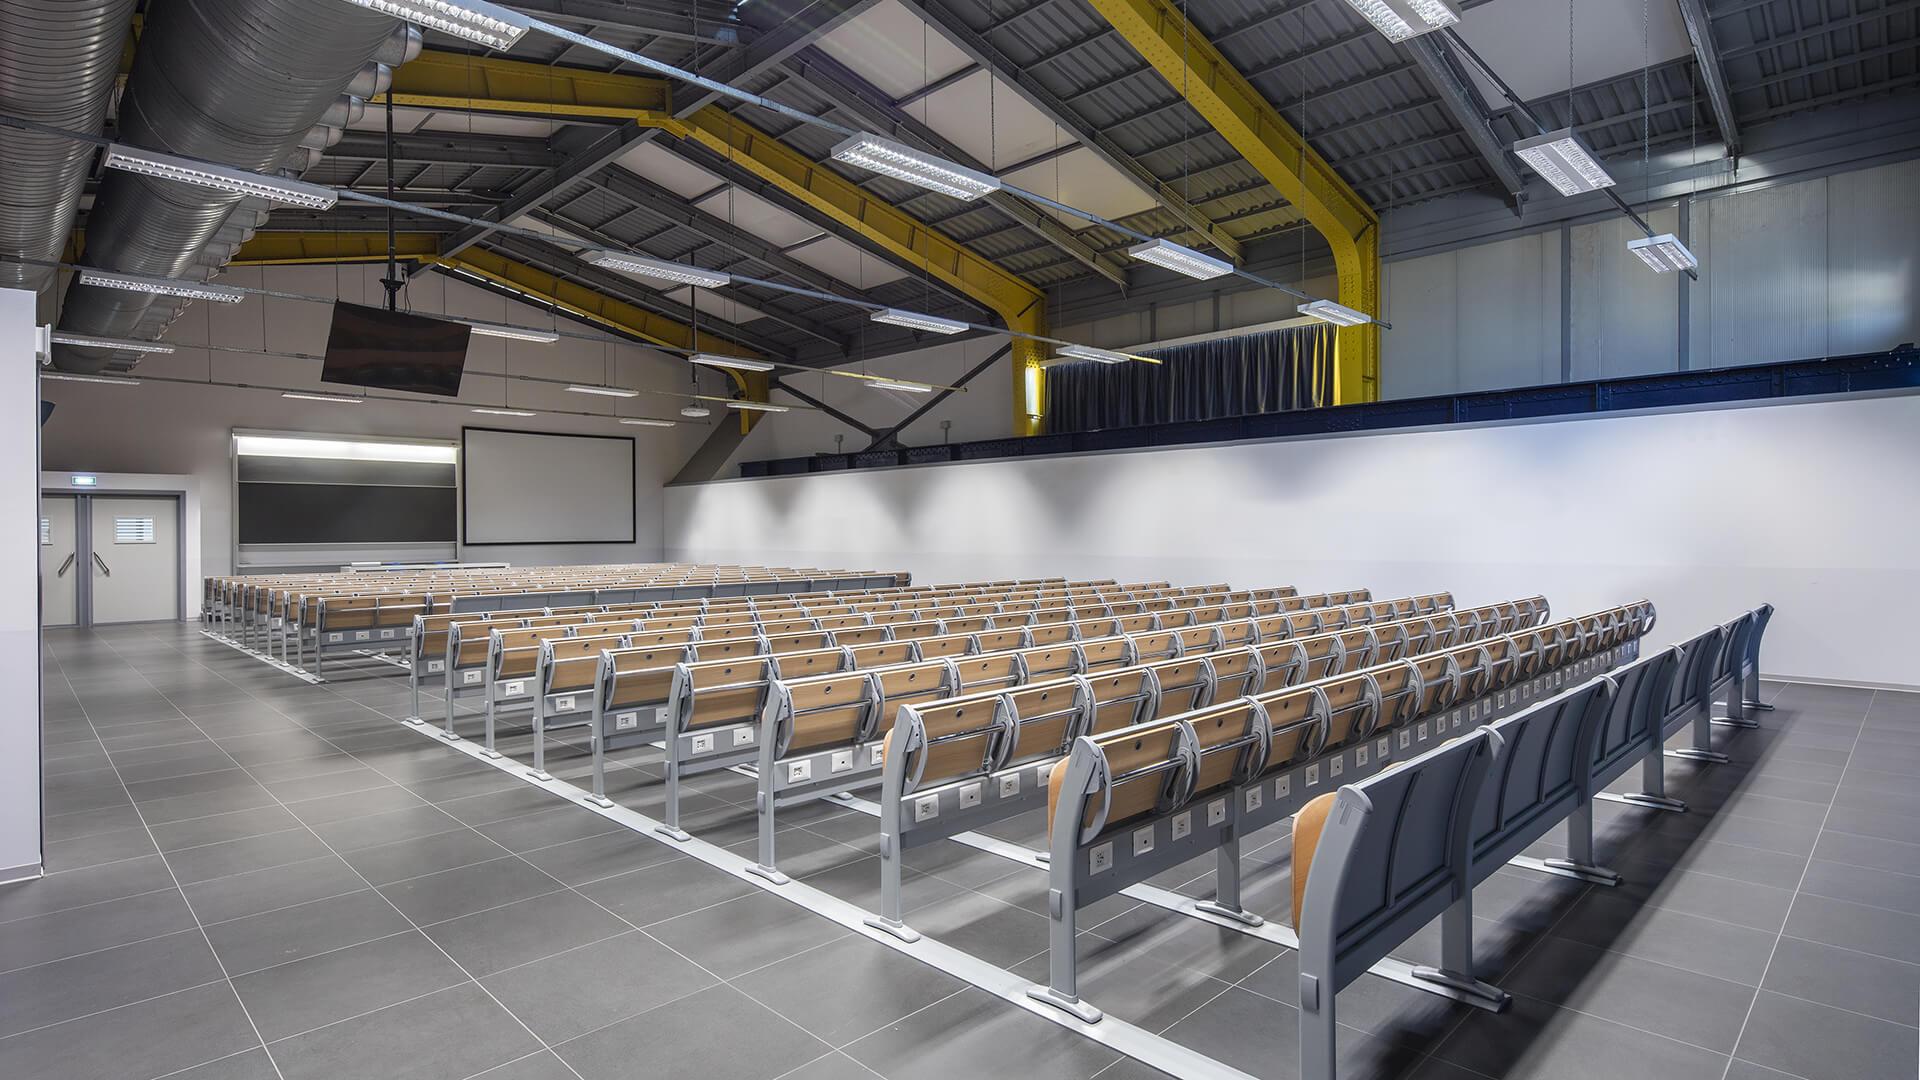 Politecnico di Milano - Campus Bovisa - Q3000 study bench by LAMM